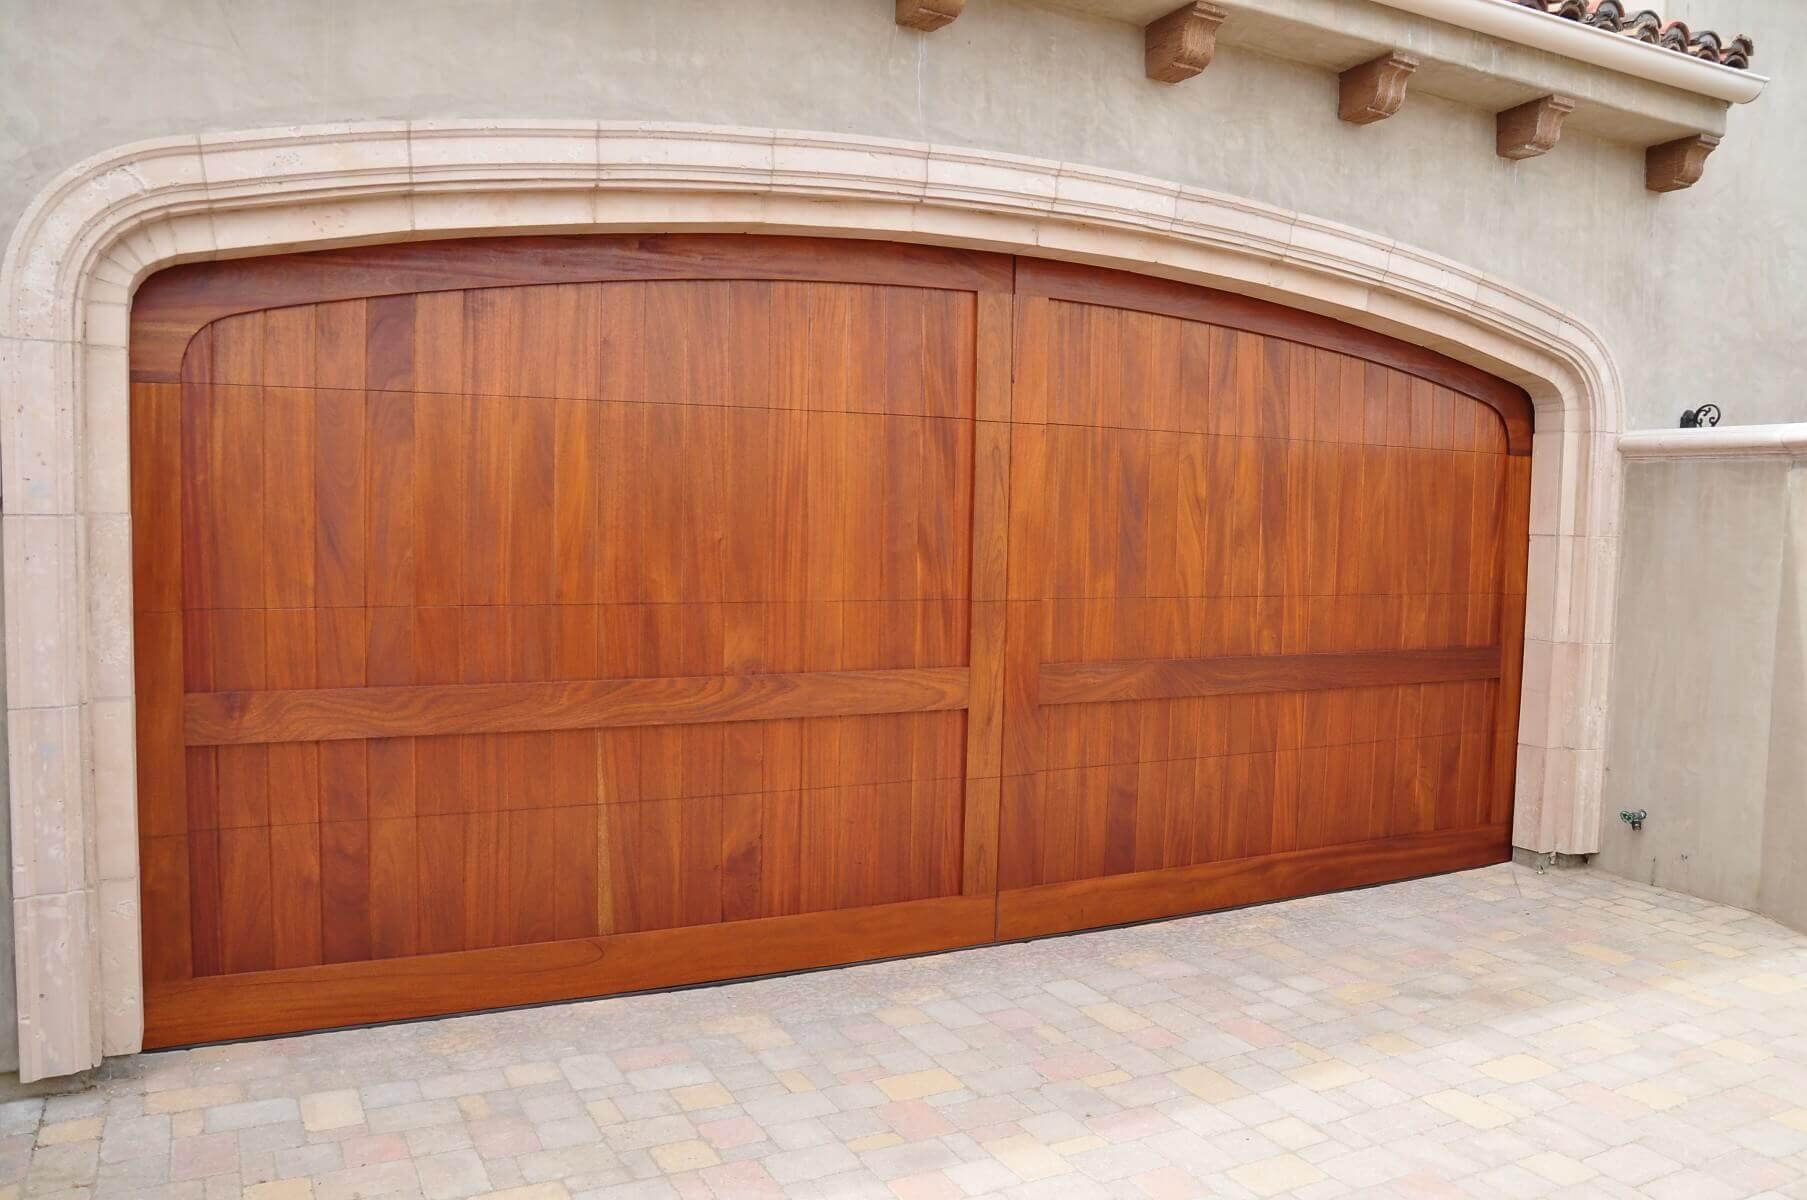 After Santa Rosa Valley Camarillo Garage Door Replacement